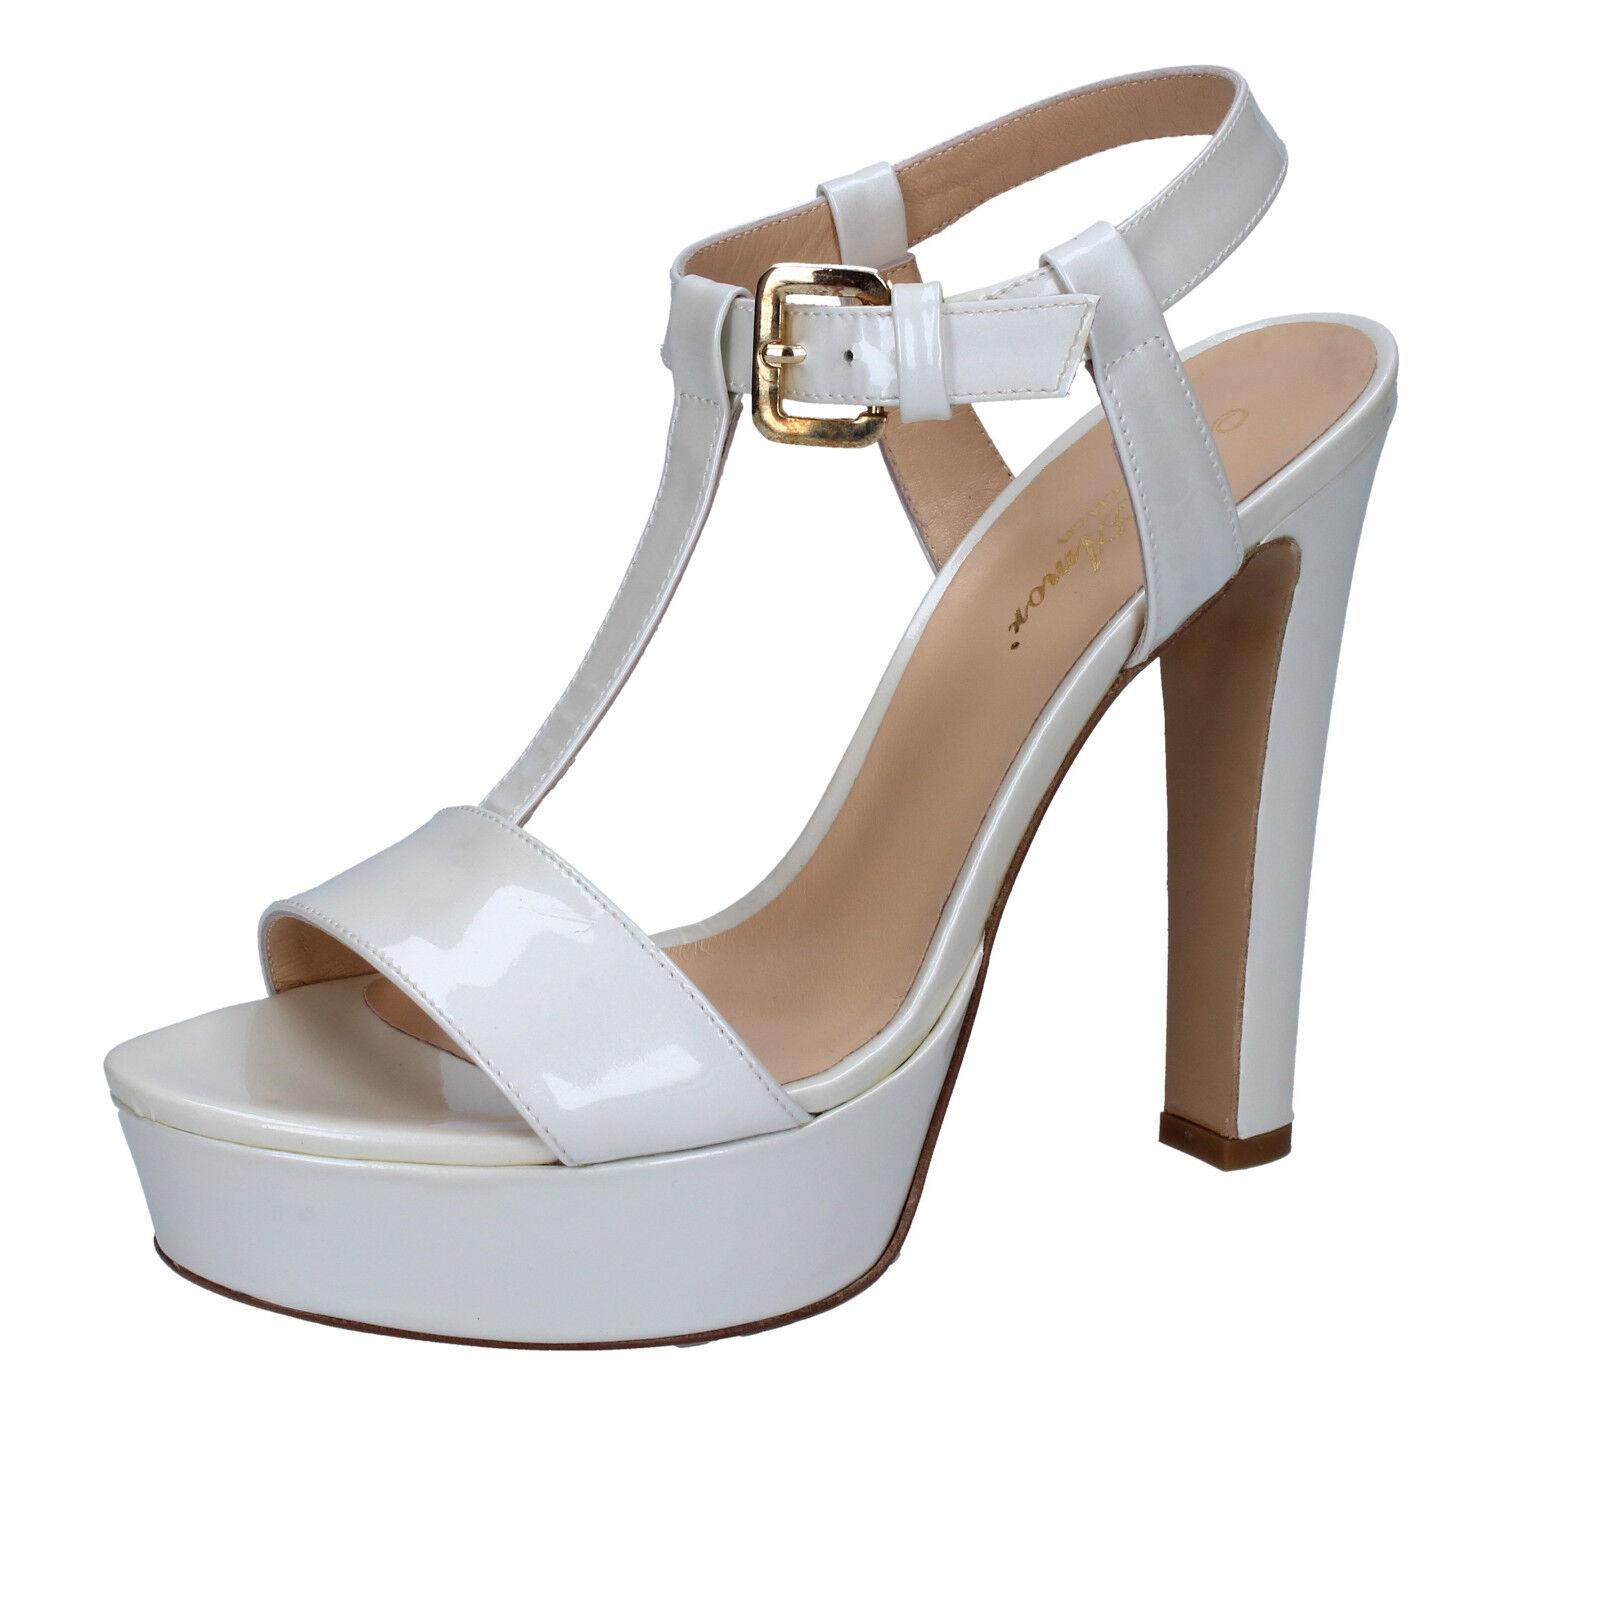 donna MI AMOR vernice 39 EU sandali bianco vernice AMOR BY167-C 2c899a